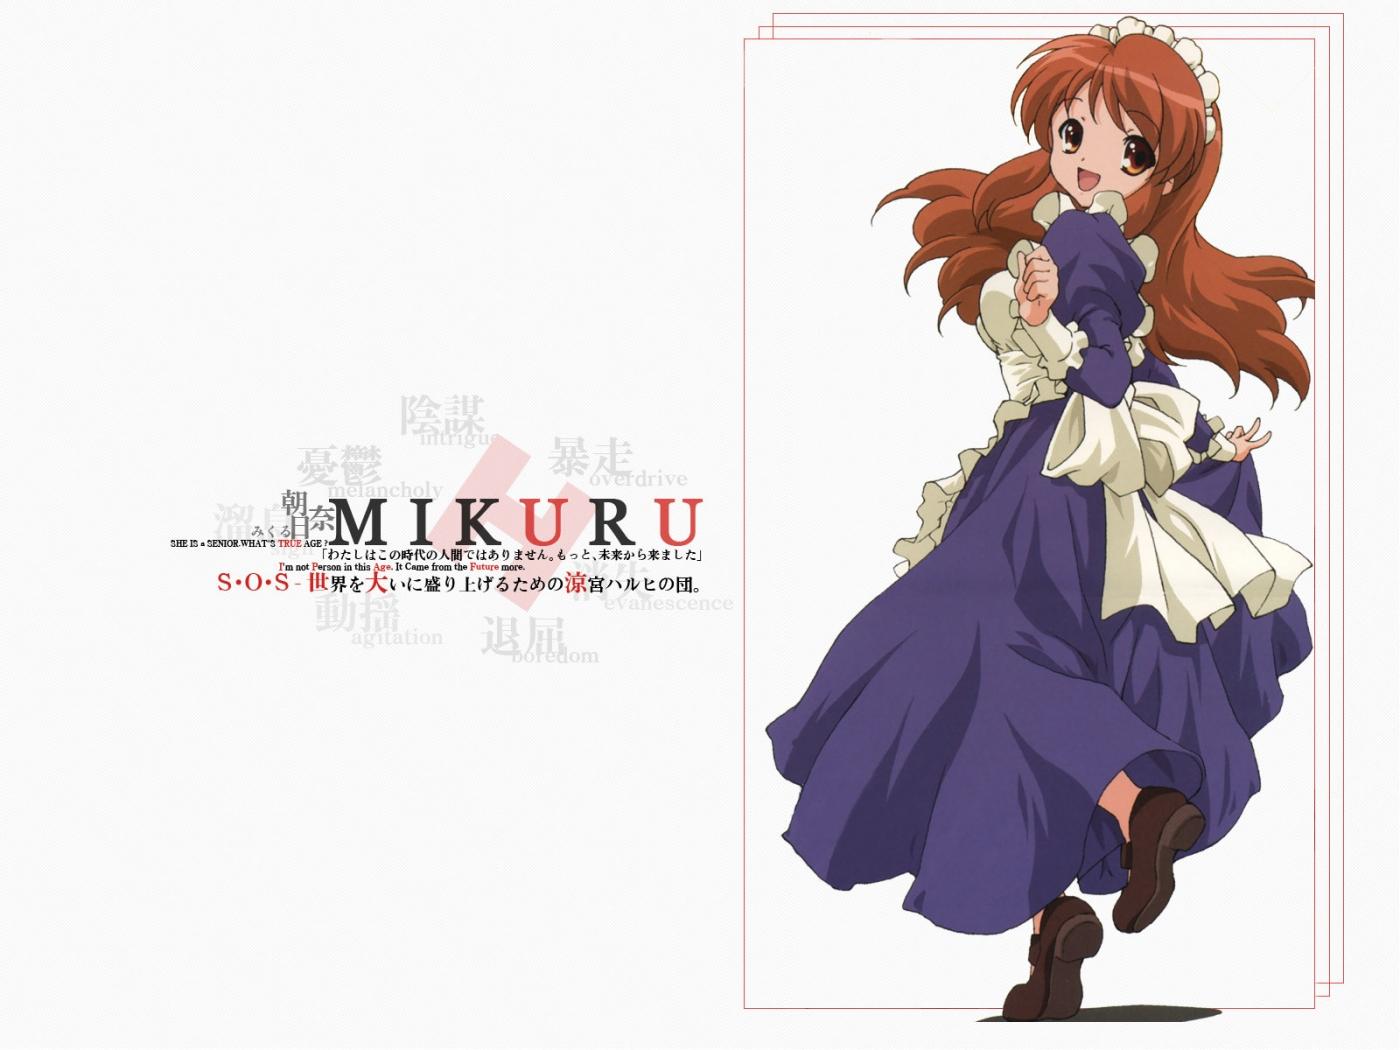 The Melancholy of Haruhi Suzumiya Anime Wallpaper # 2